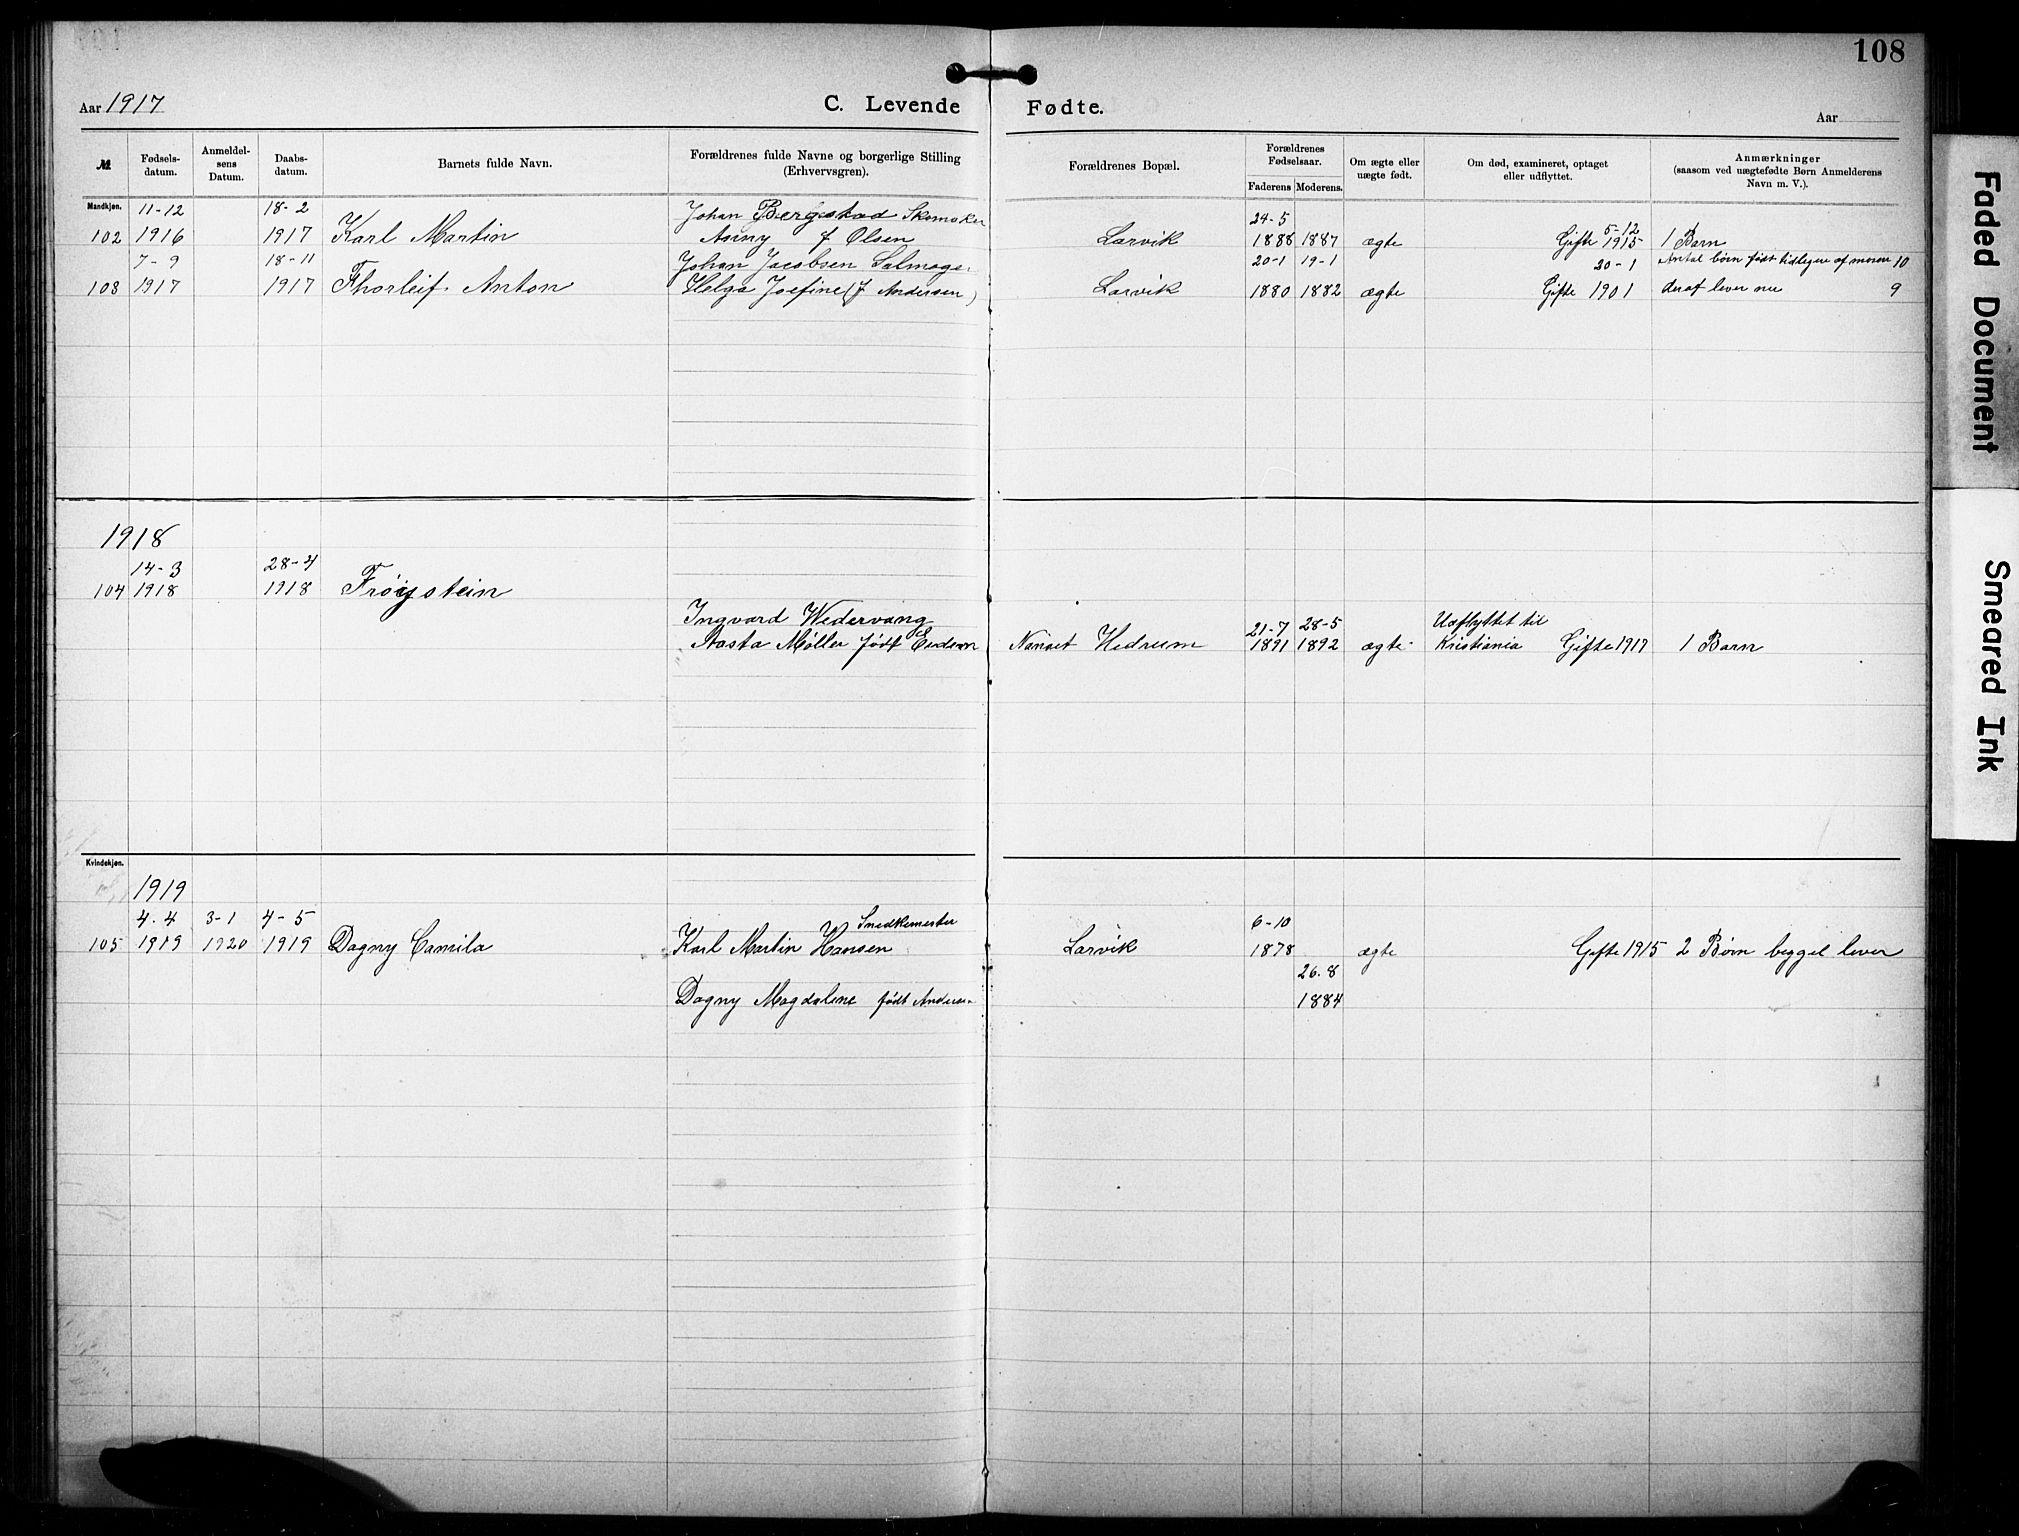 SAKO, Den katolsk-apostoliske menighet i Larvik, F/Fa/L0001: Dissenterprotokoll nr. 1, 1892-1933, s. 108